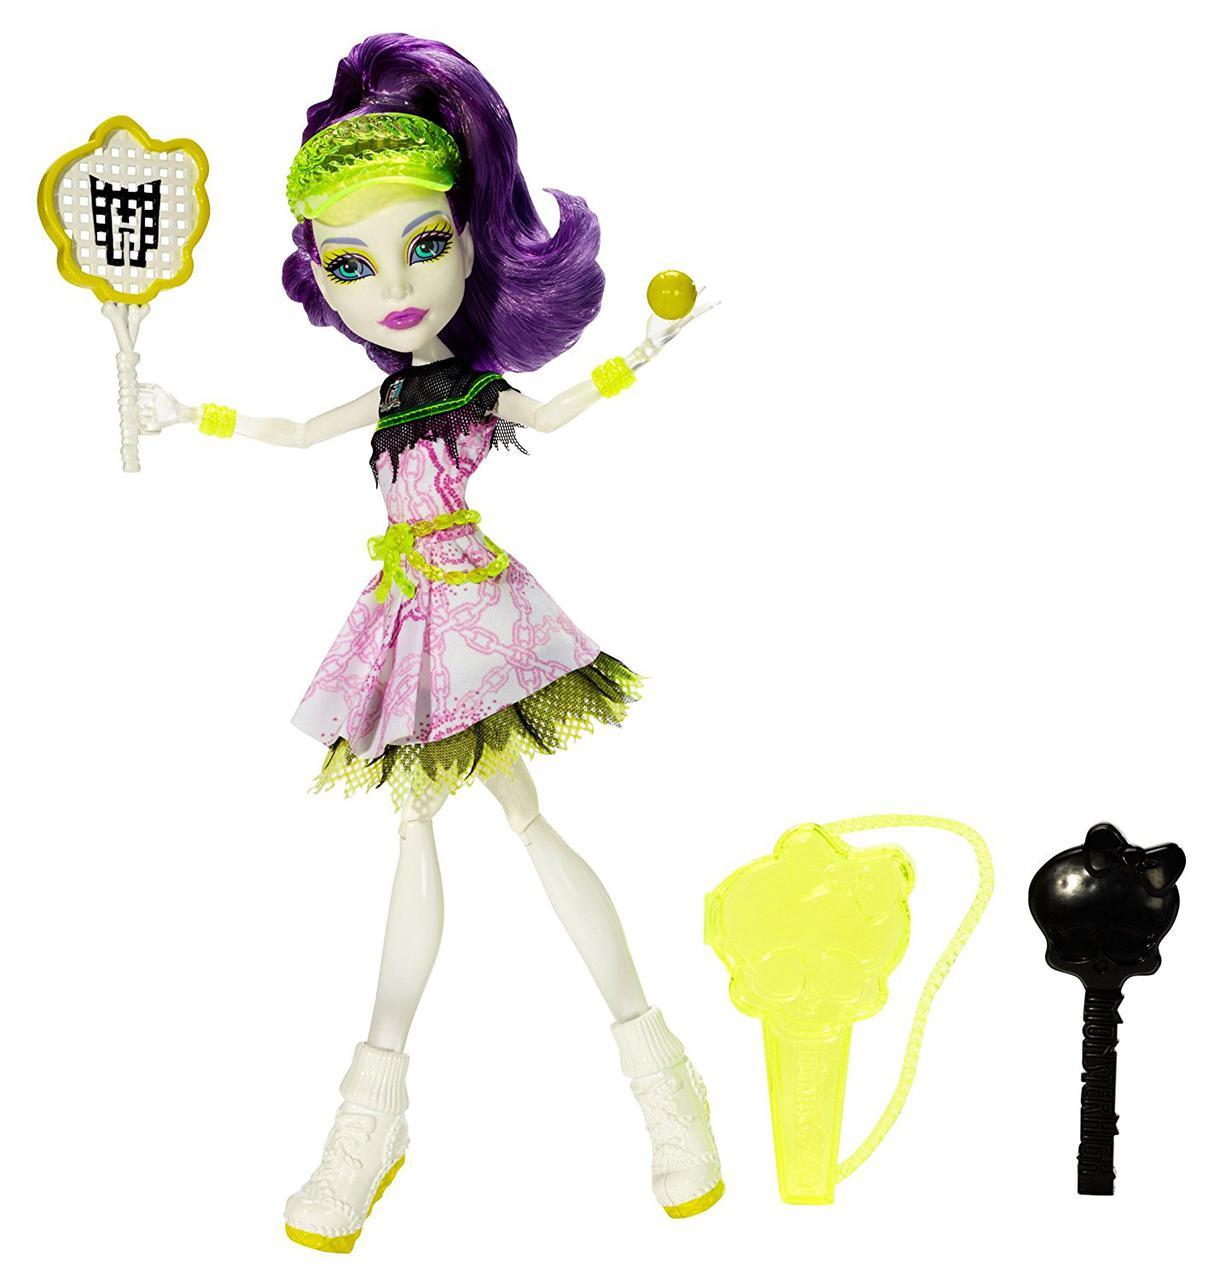 Кукла Монстер Хай Спектра Вондергейст Спорт Монстров Monster High Spectra Vondergeist Ghoul Sports Doll